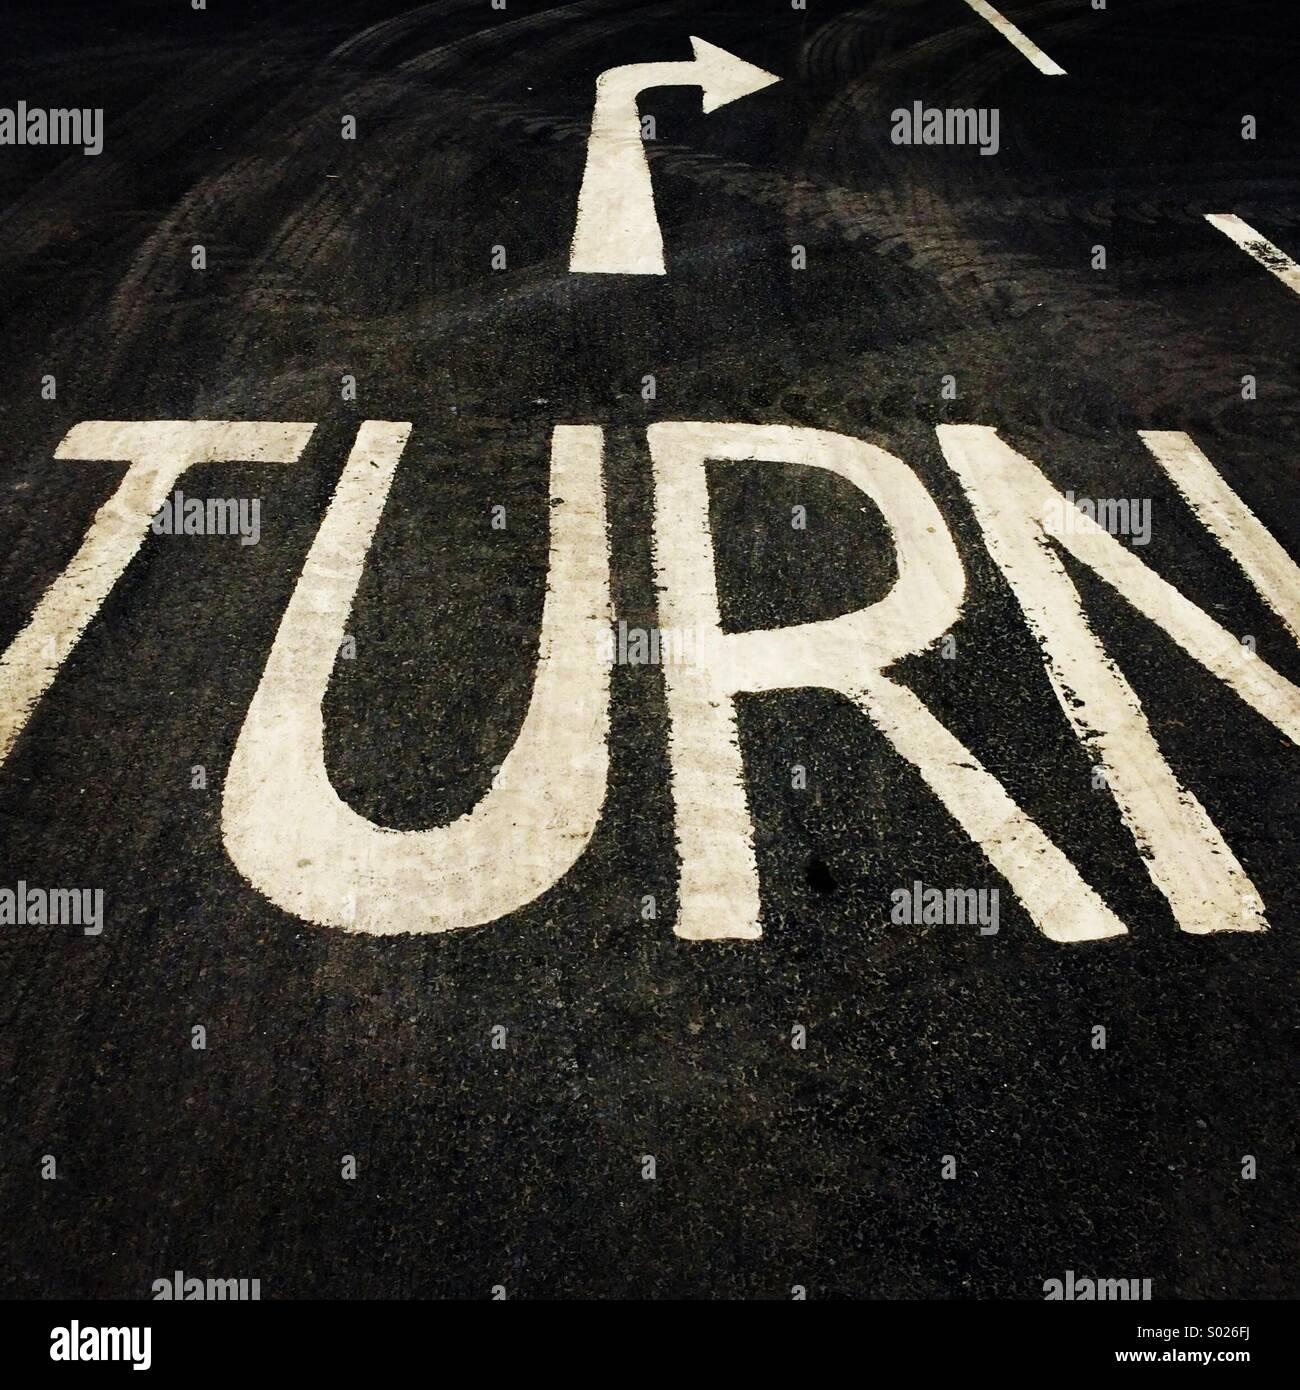 Turn. - Stock Image